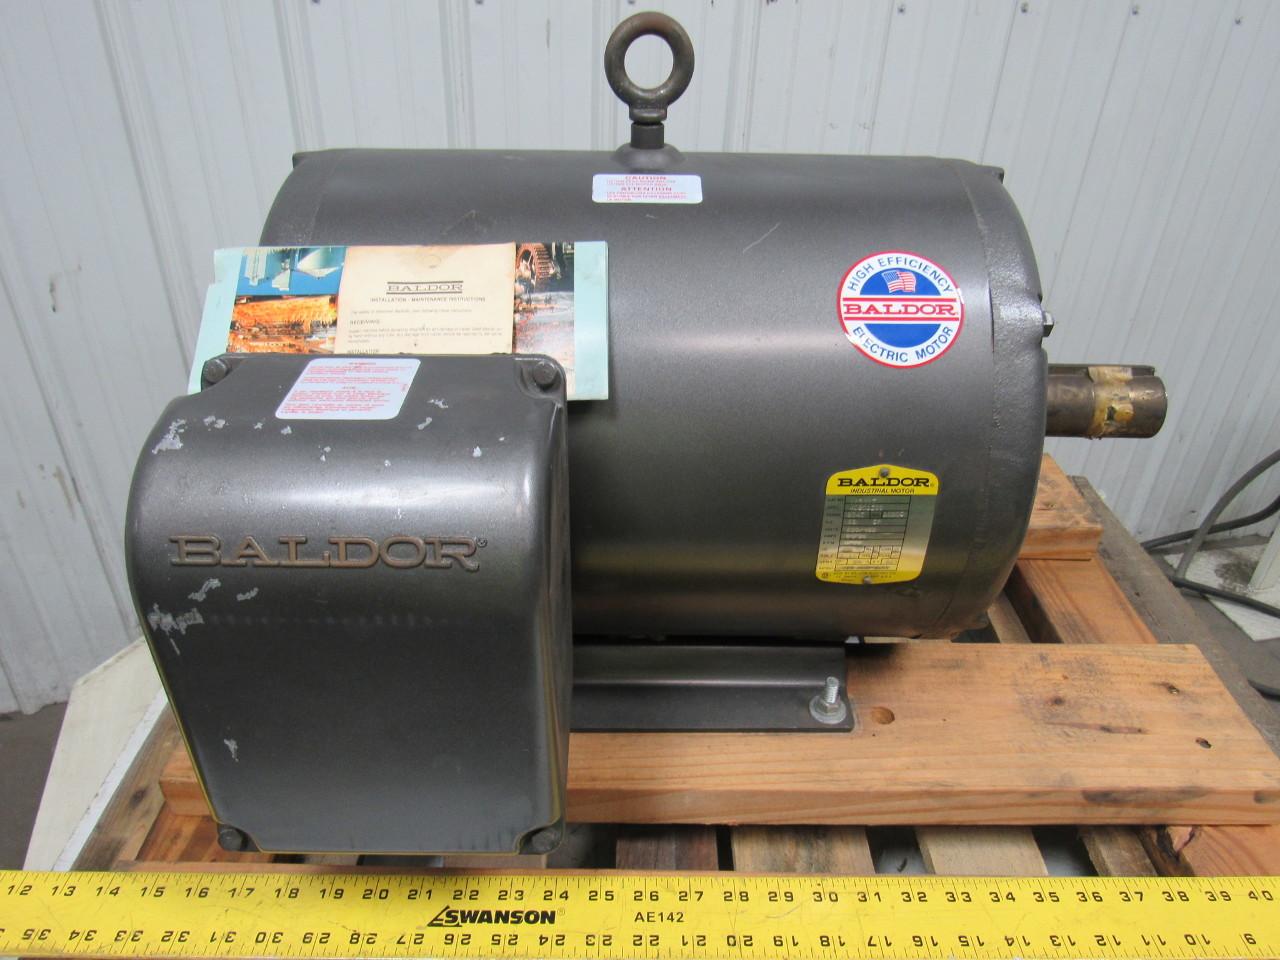 Baldor M2531t 25 Hp Ac Electric Motor 230 460v 1760 Rpm